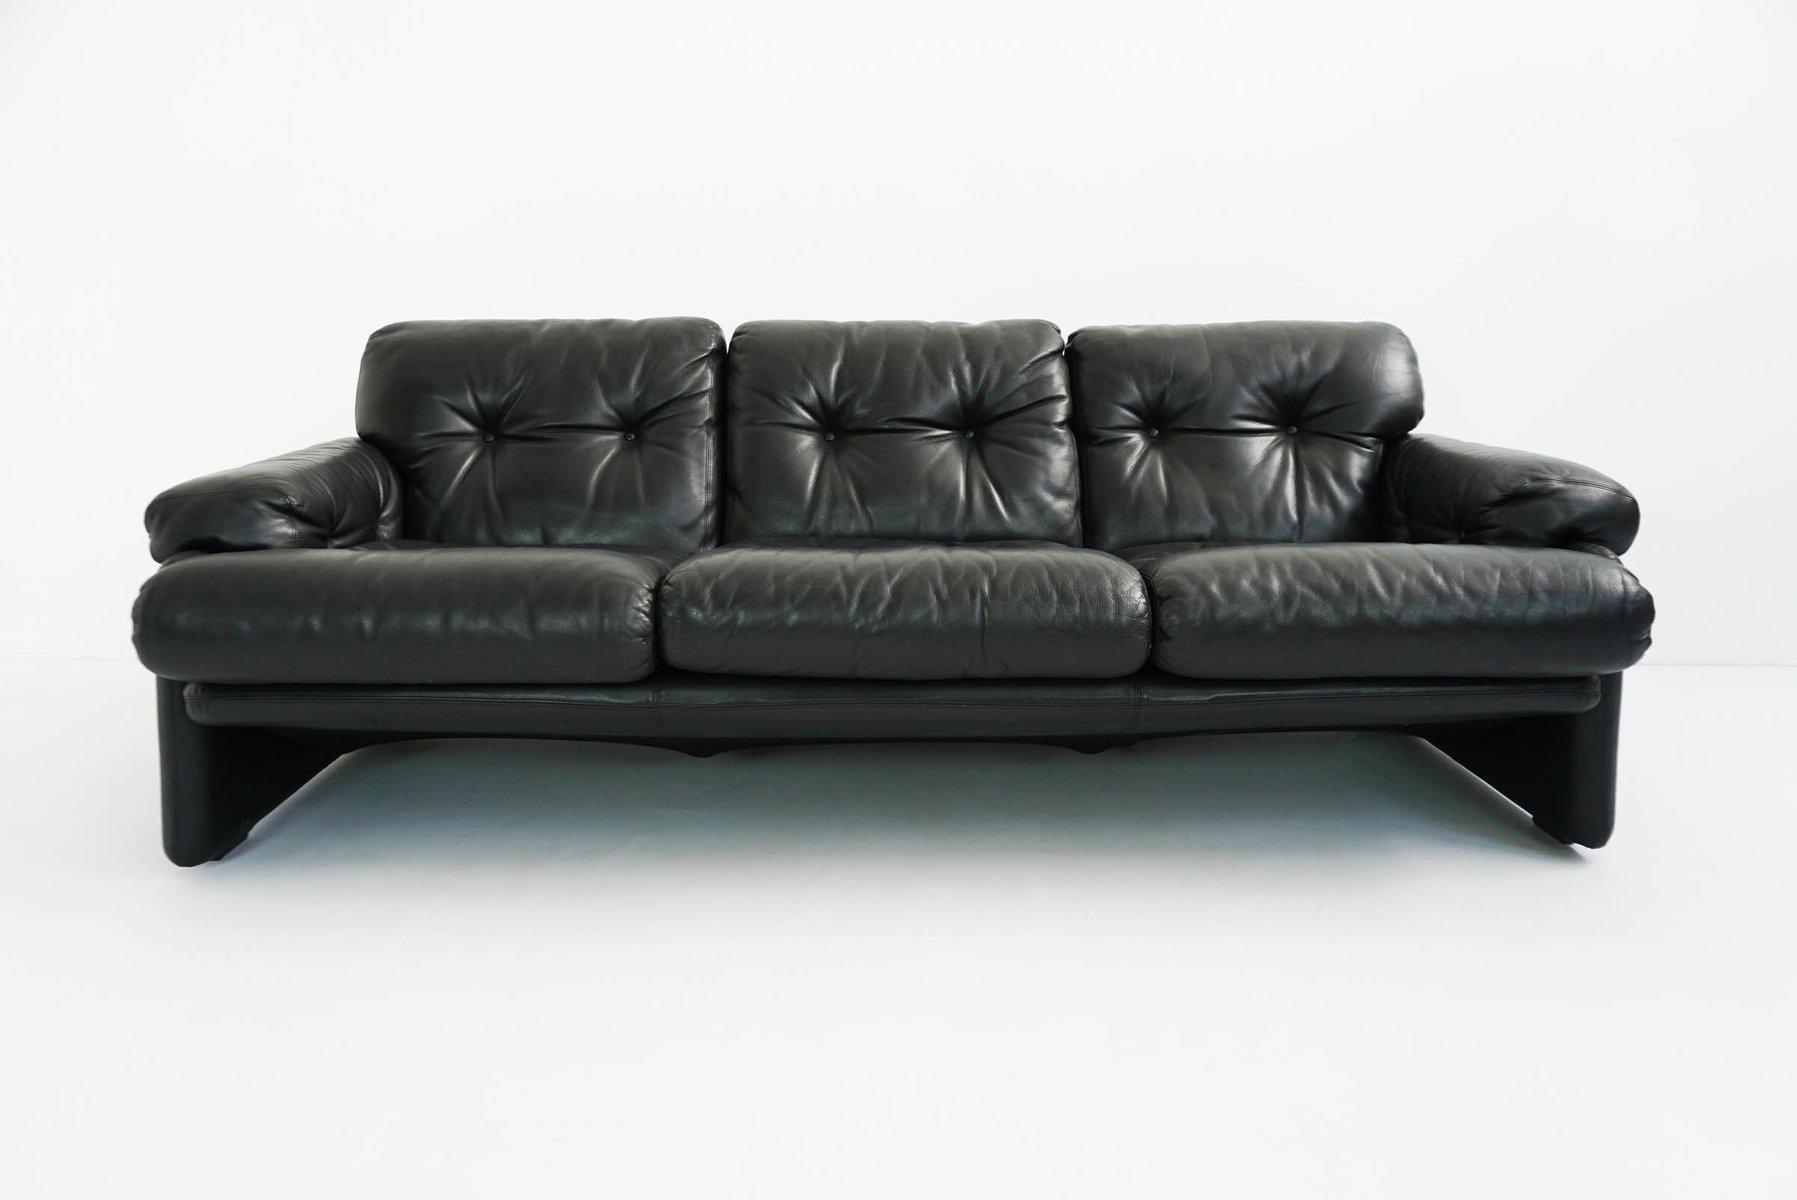 Vintage Black Leather Coronado 3 Seat Sofa By Tobia U0026 Afra Scarpa For Bu0026B  Italia / Cu0026B Italia